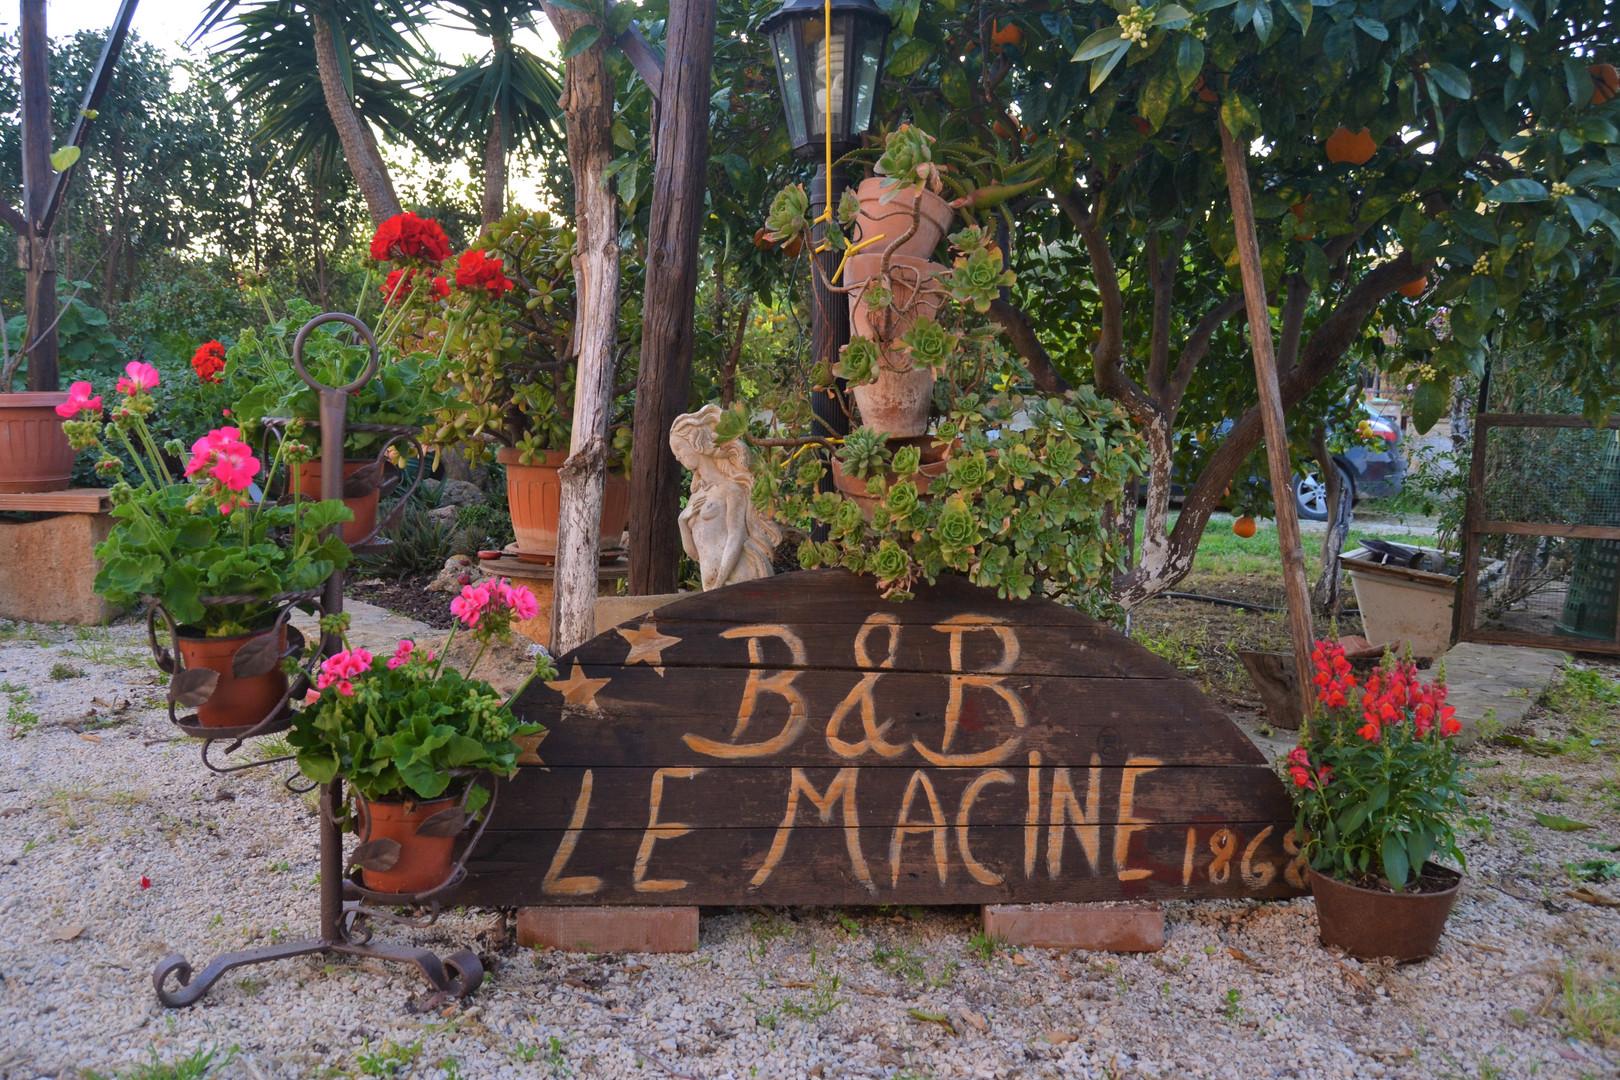 BB Le Macine dal 1869